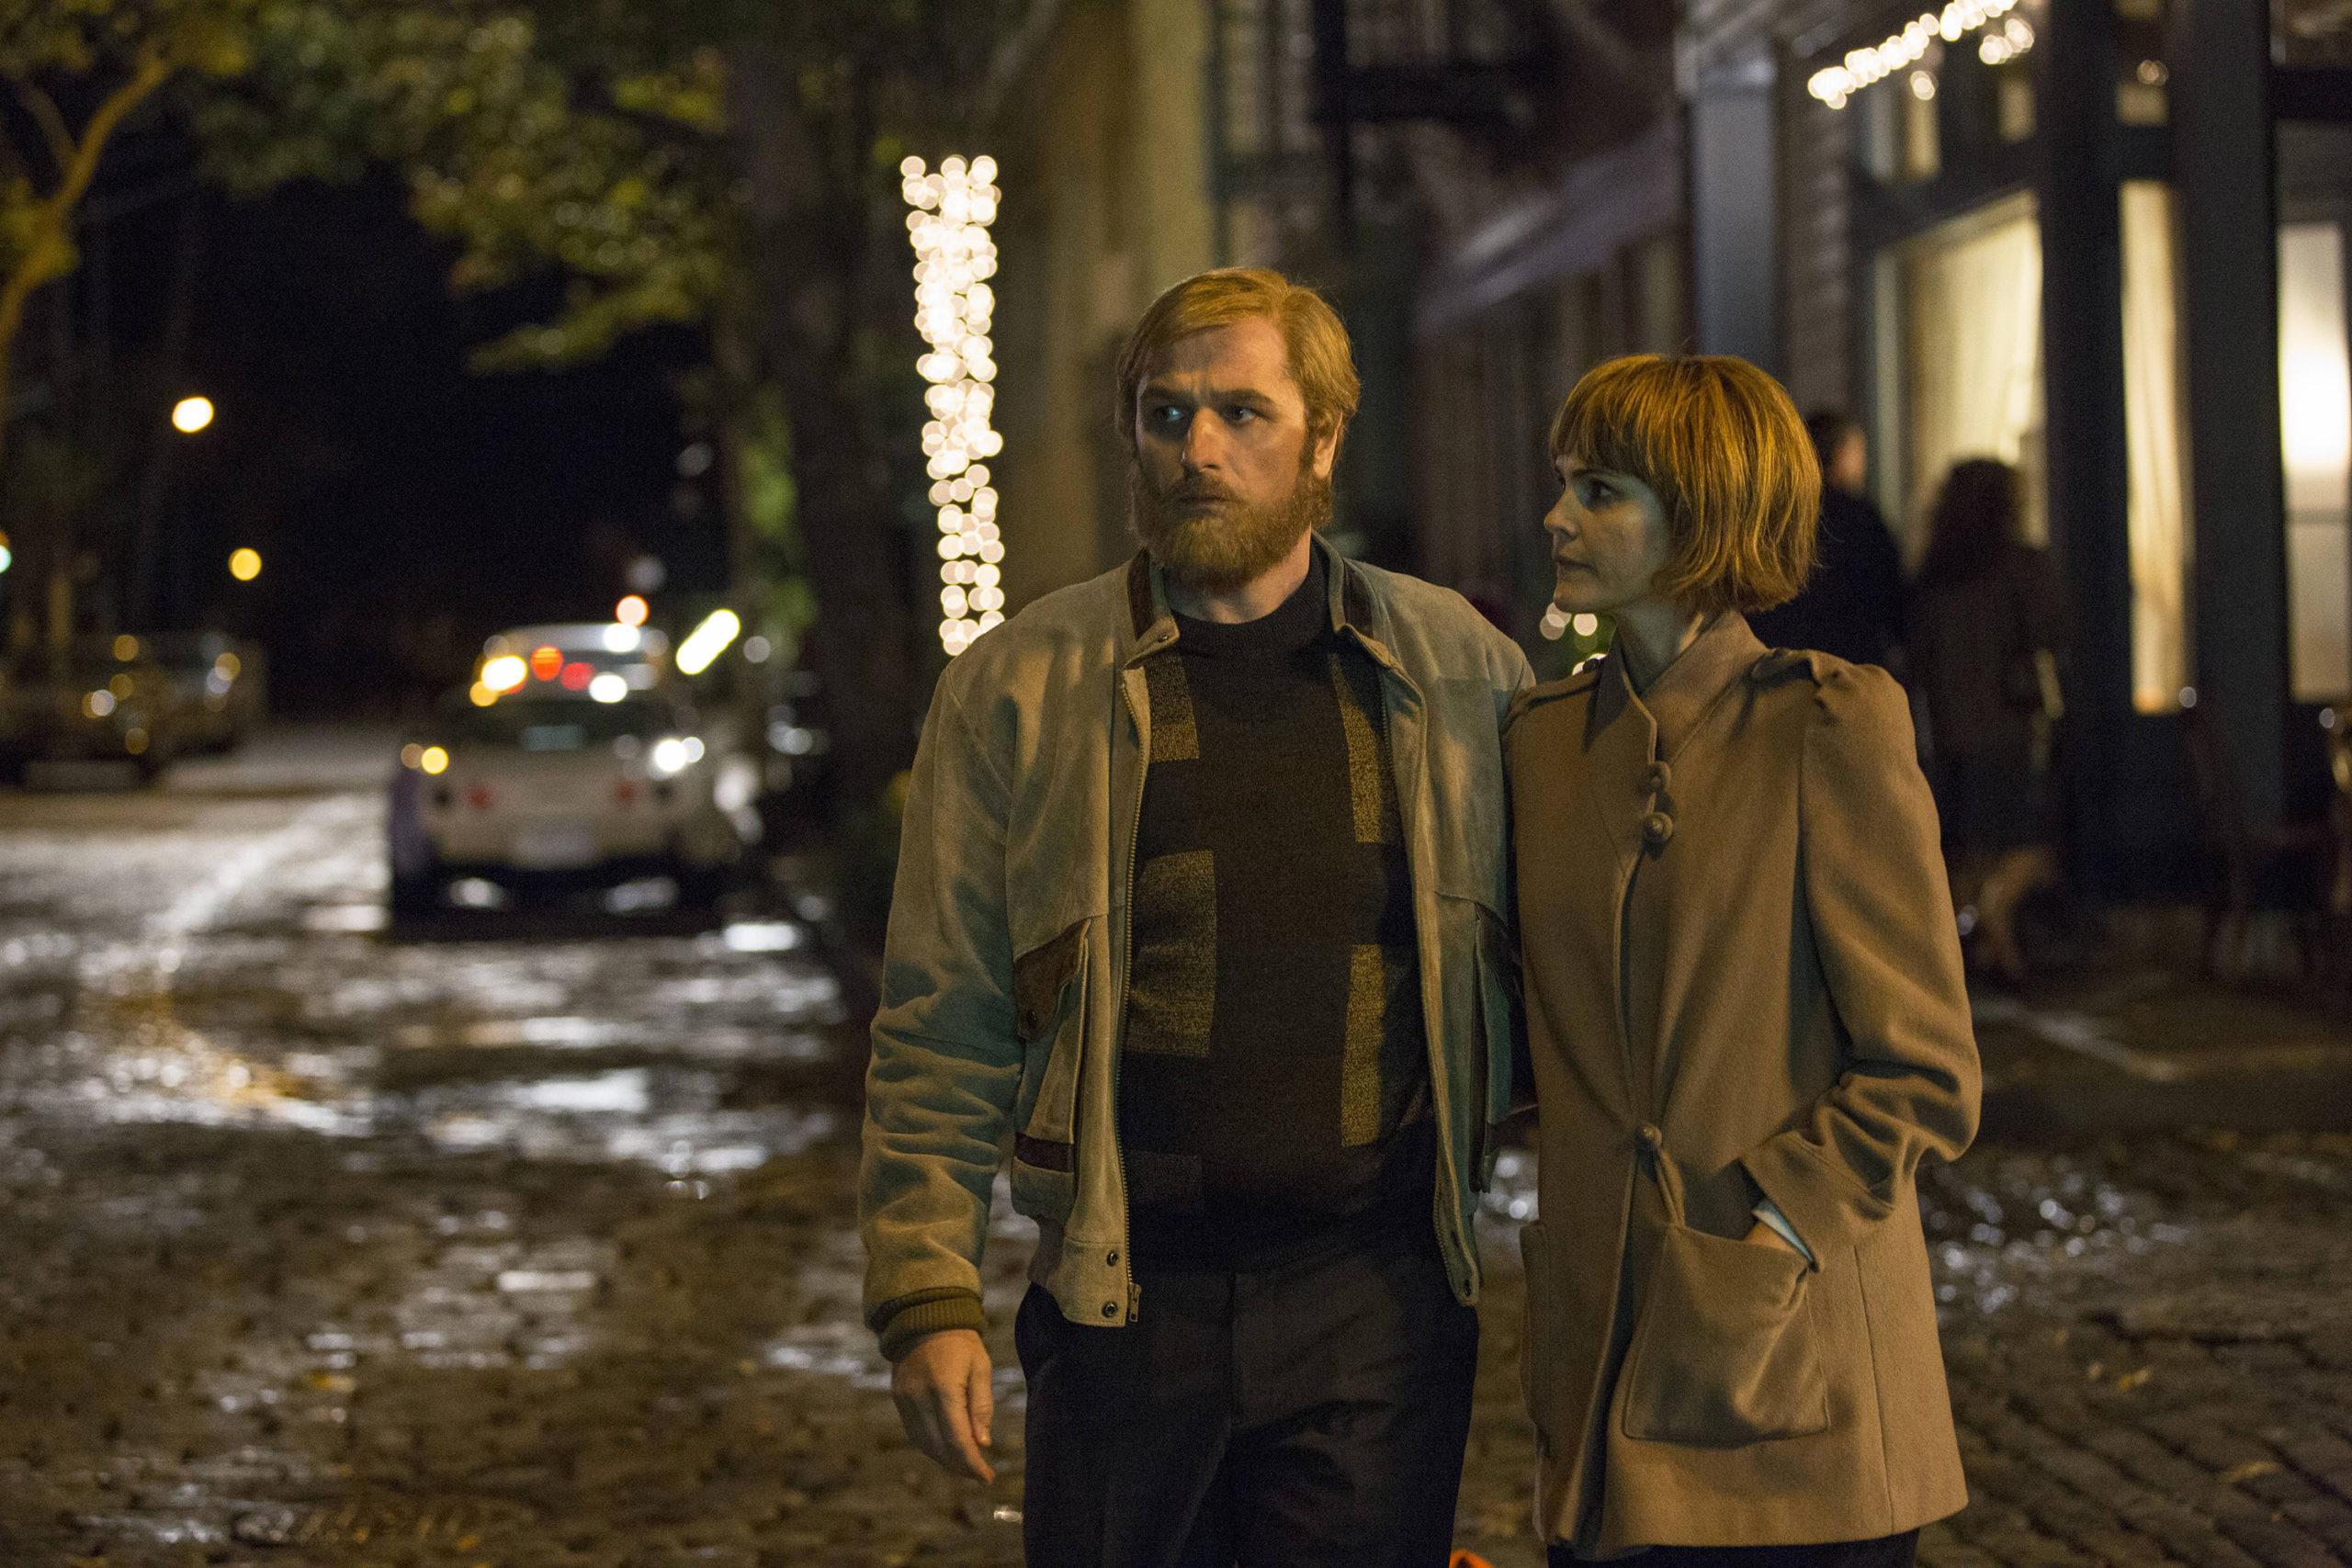 The Americans, Matthew Rhys, Keri Russell